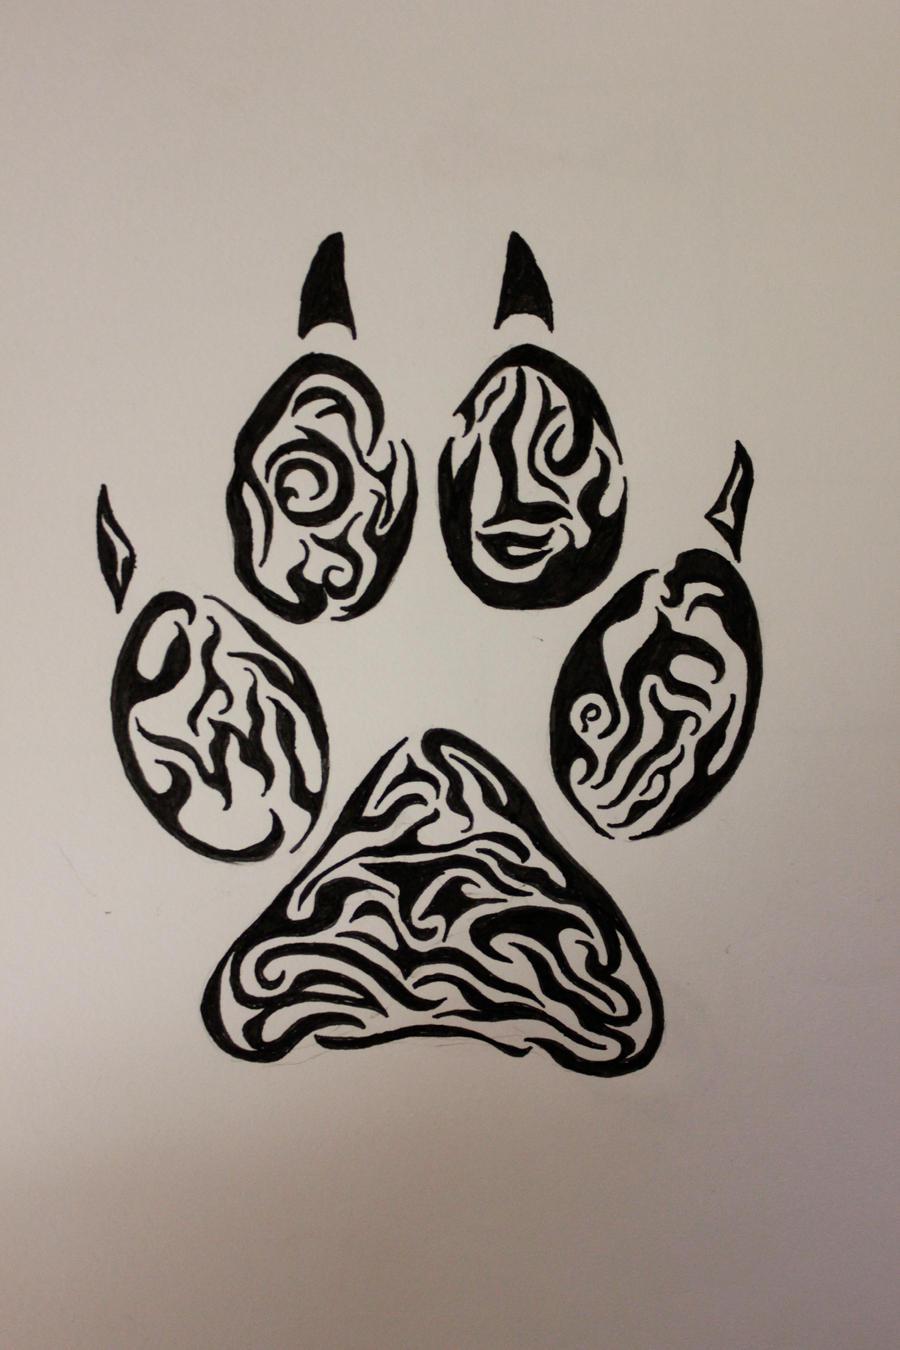 Tribal-Tattoos wolf_paw_tribal_tattoo_by_wolfbaltodog-d5adkdu